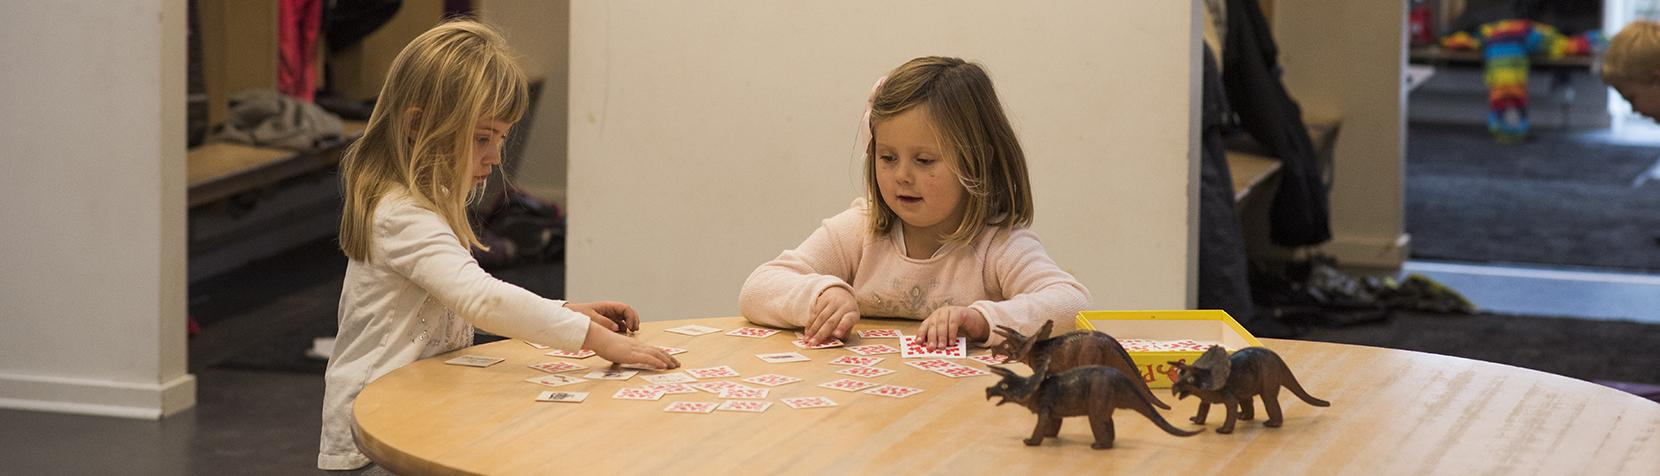 Piger leger med dinosaurere